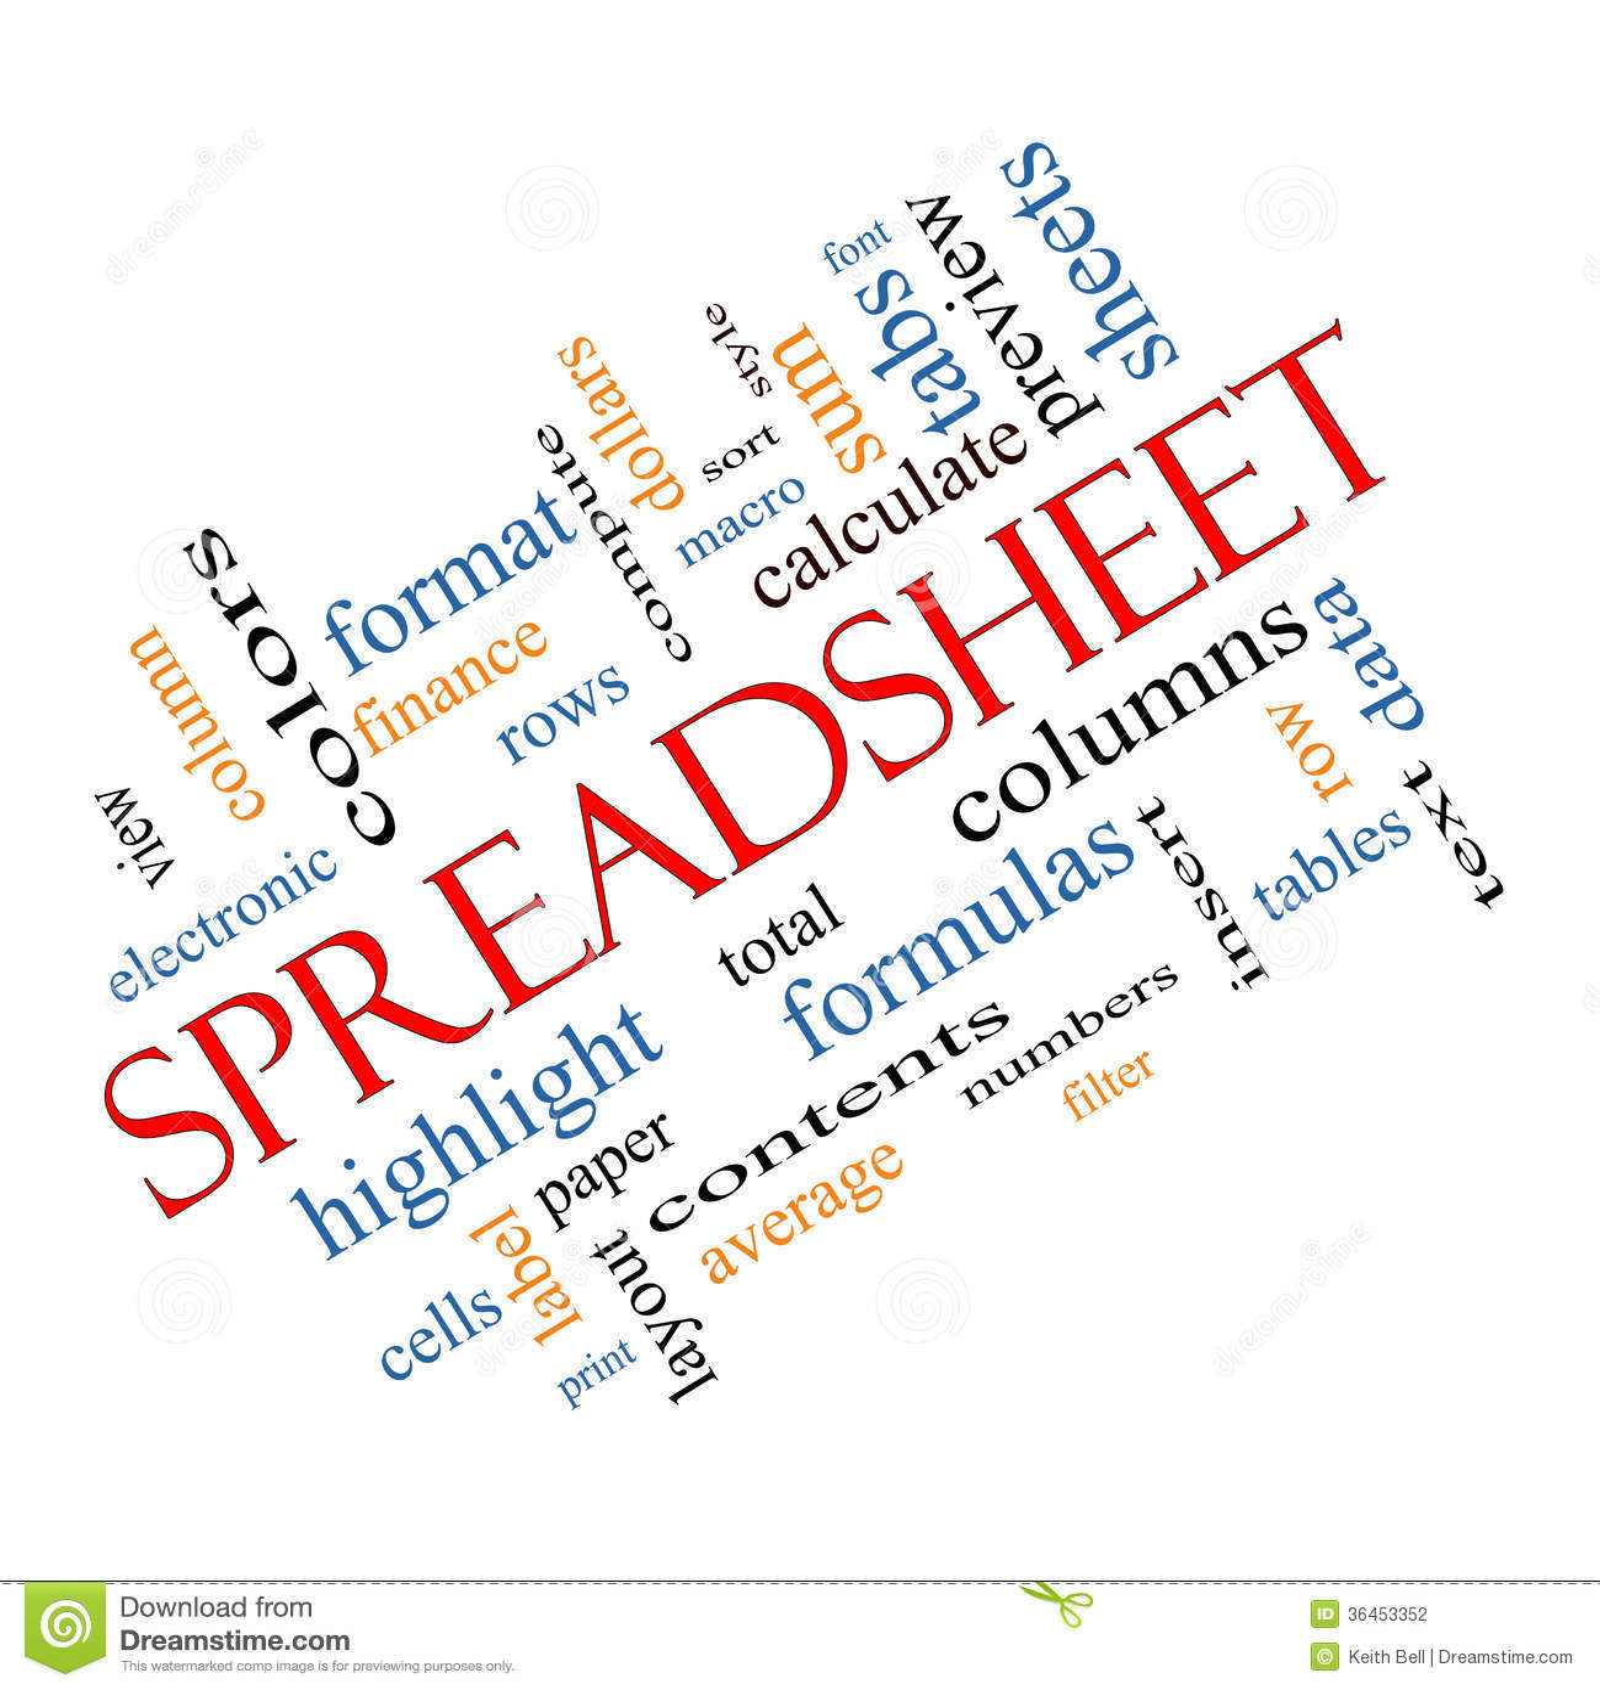 Spreadsheet Word Cloud Glowing Royalty Free Illustration